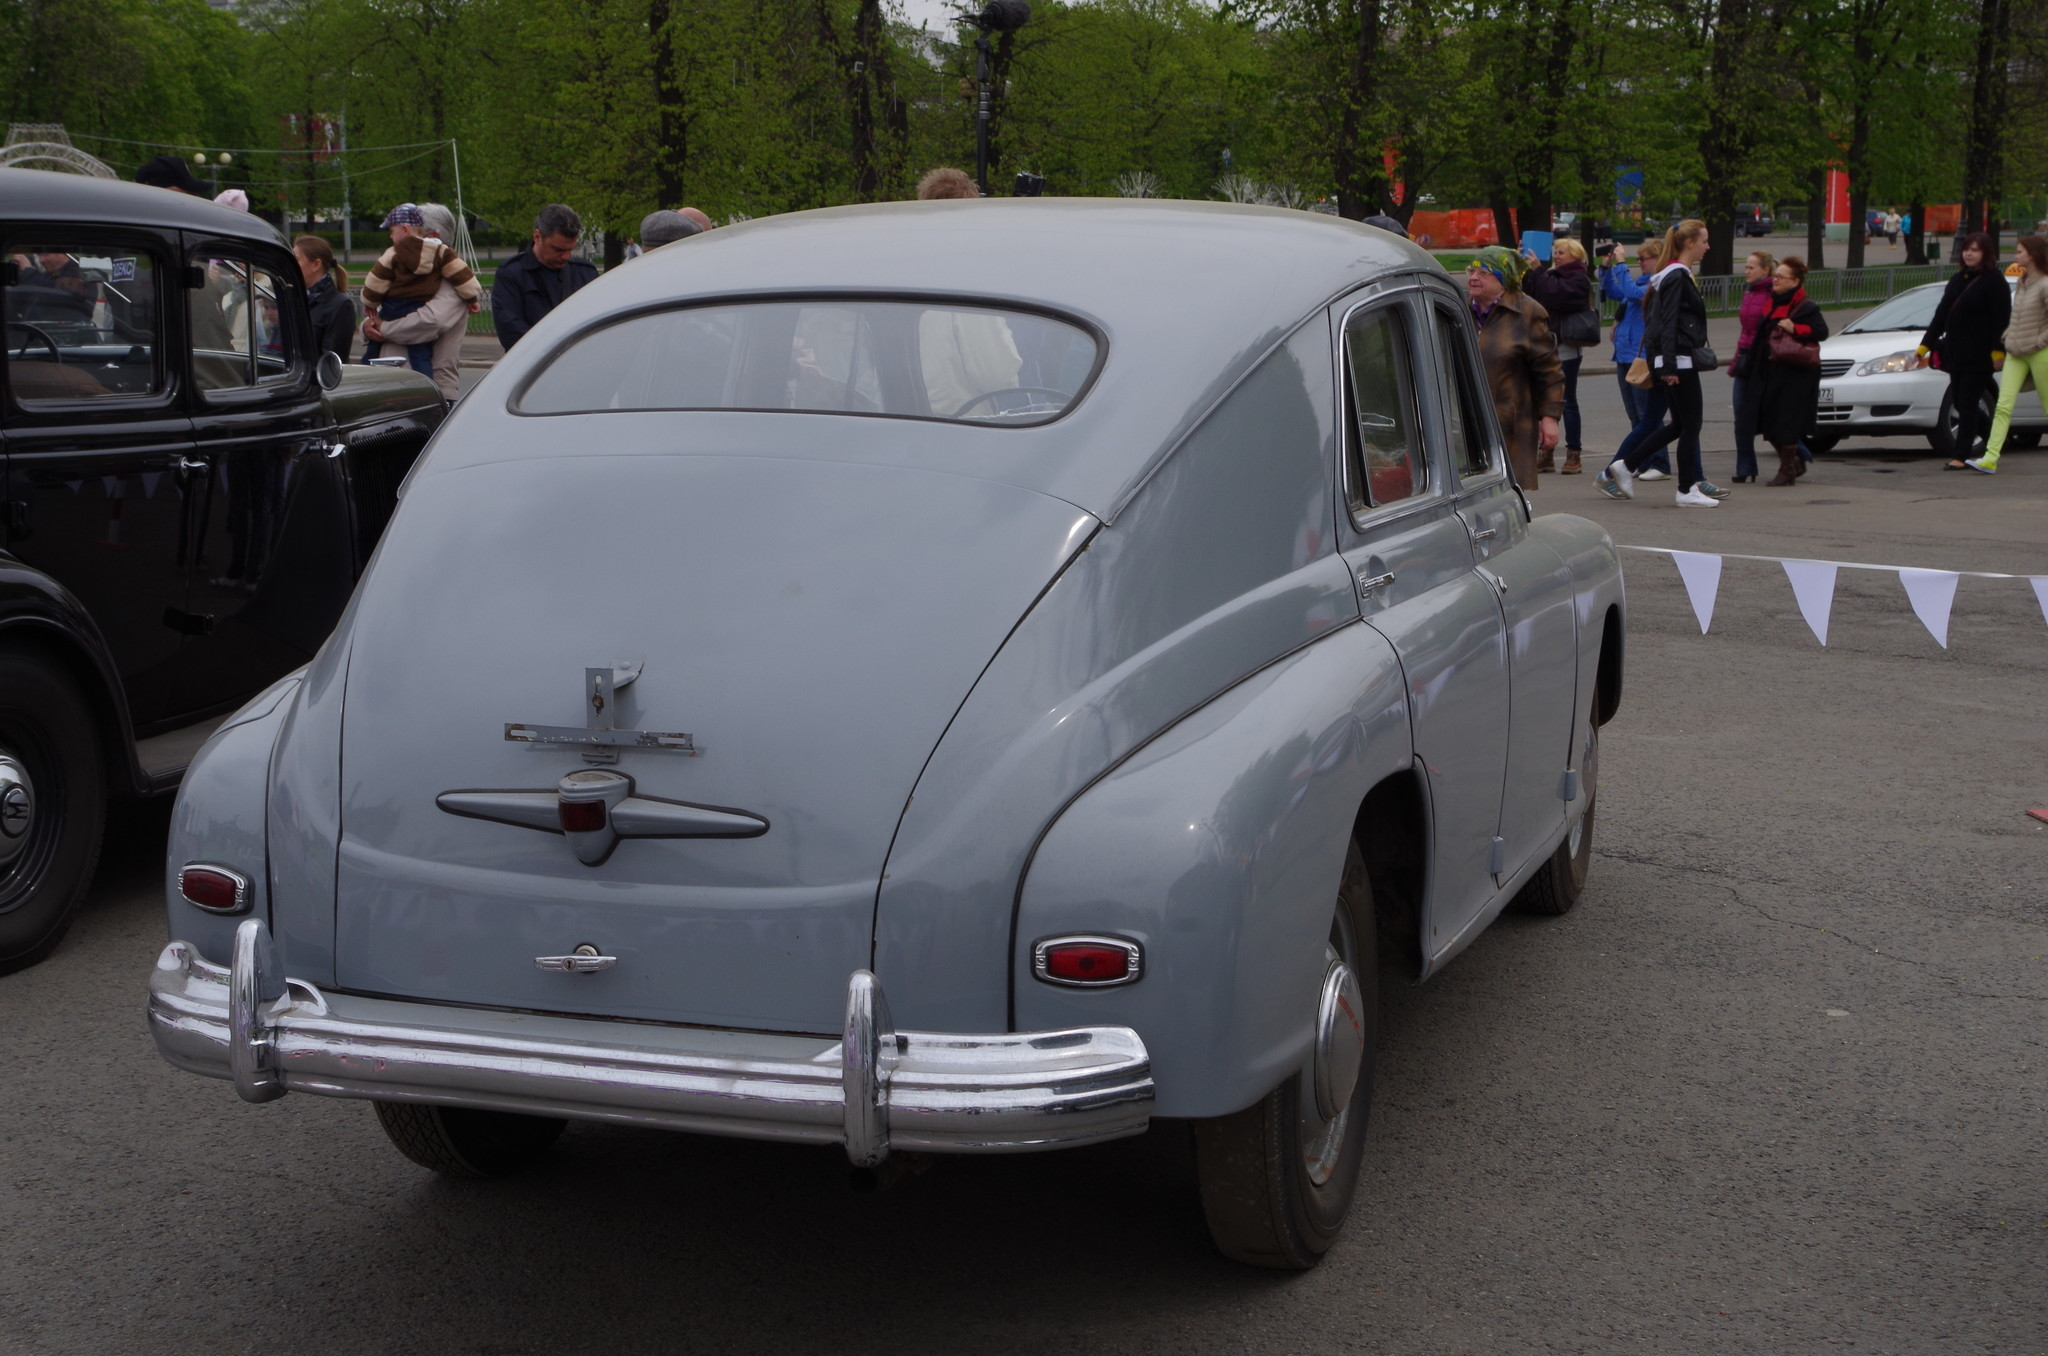 Автомобиль ГАЗ-М-20 «Победа»